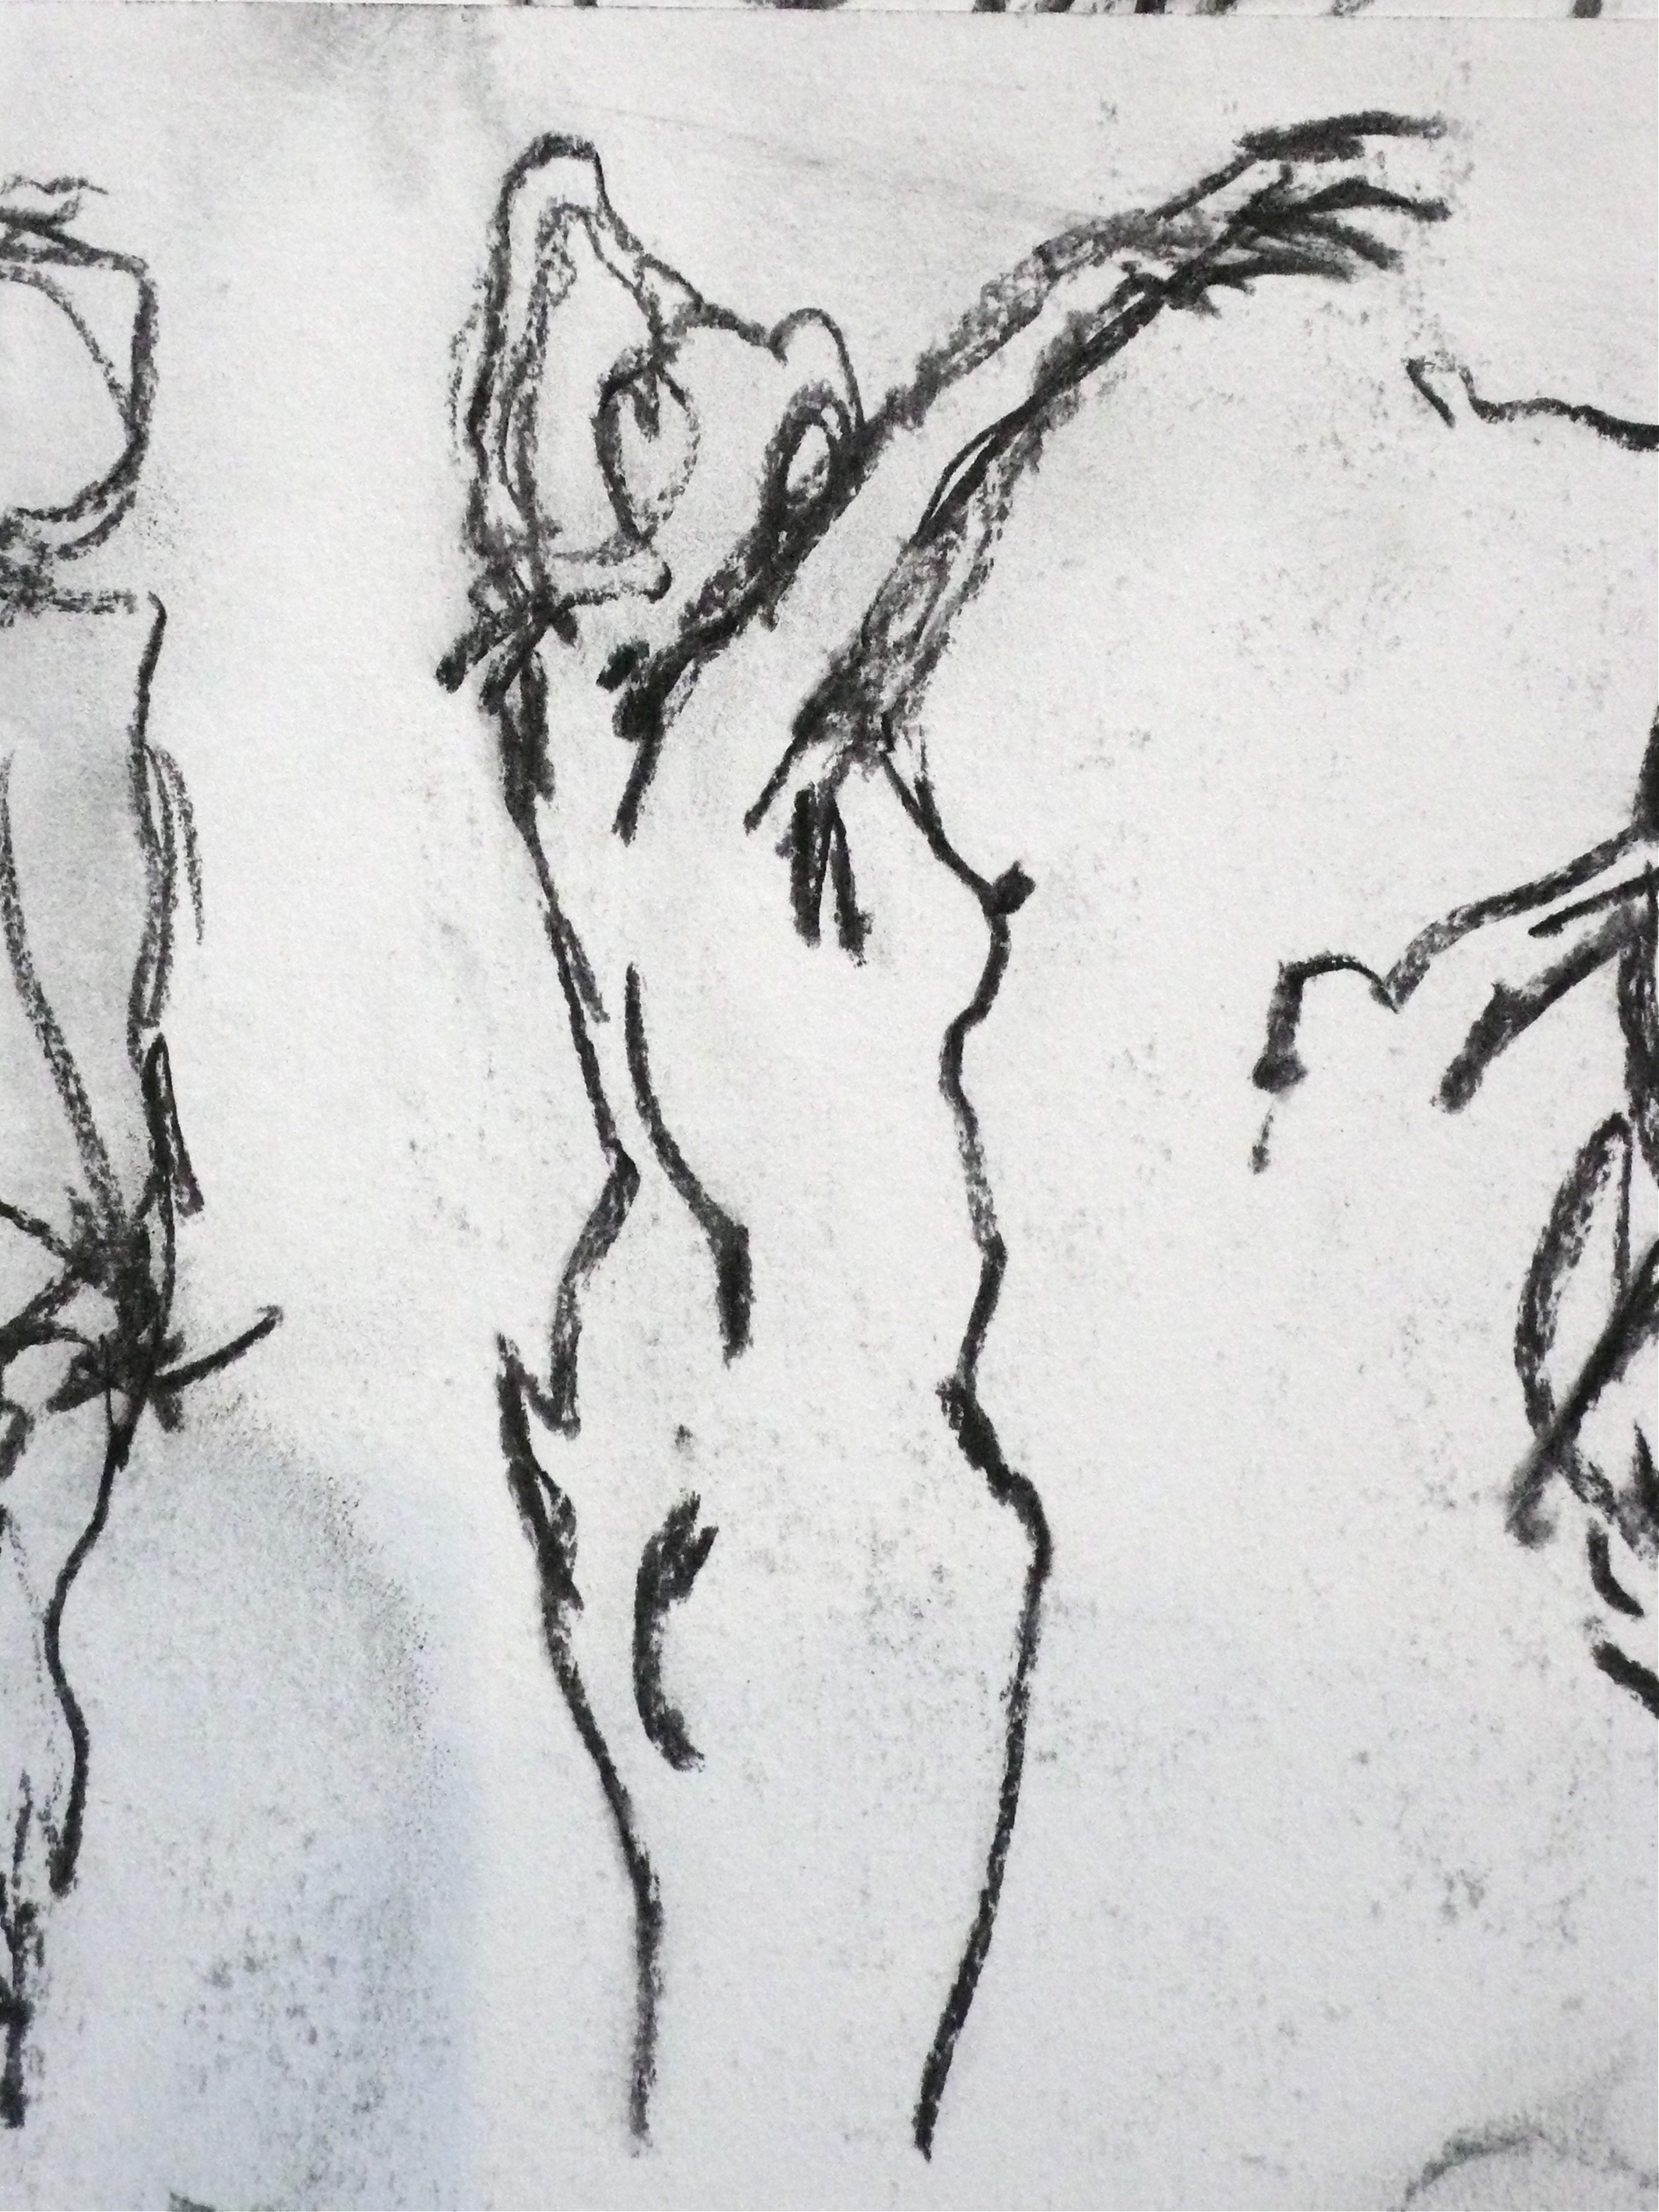 29-june-one-minute-sketch_2755935345_o.jpg